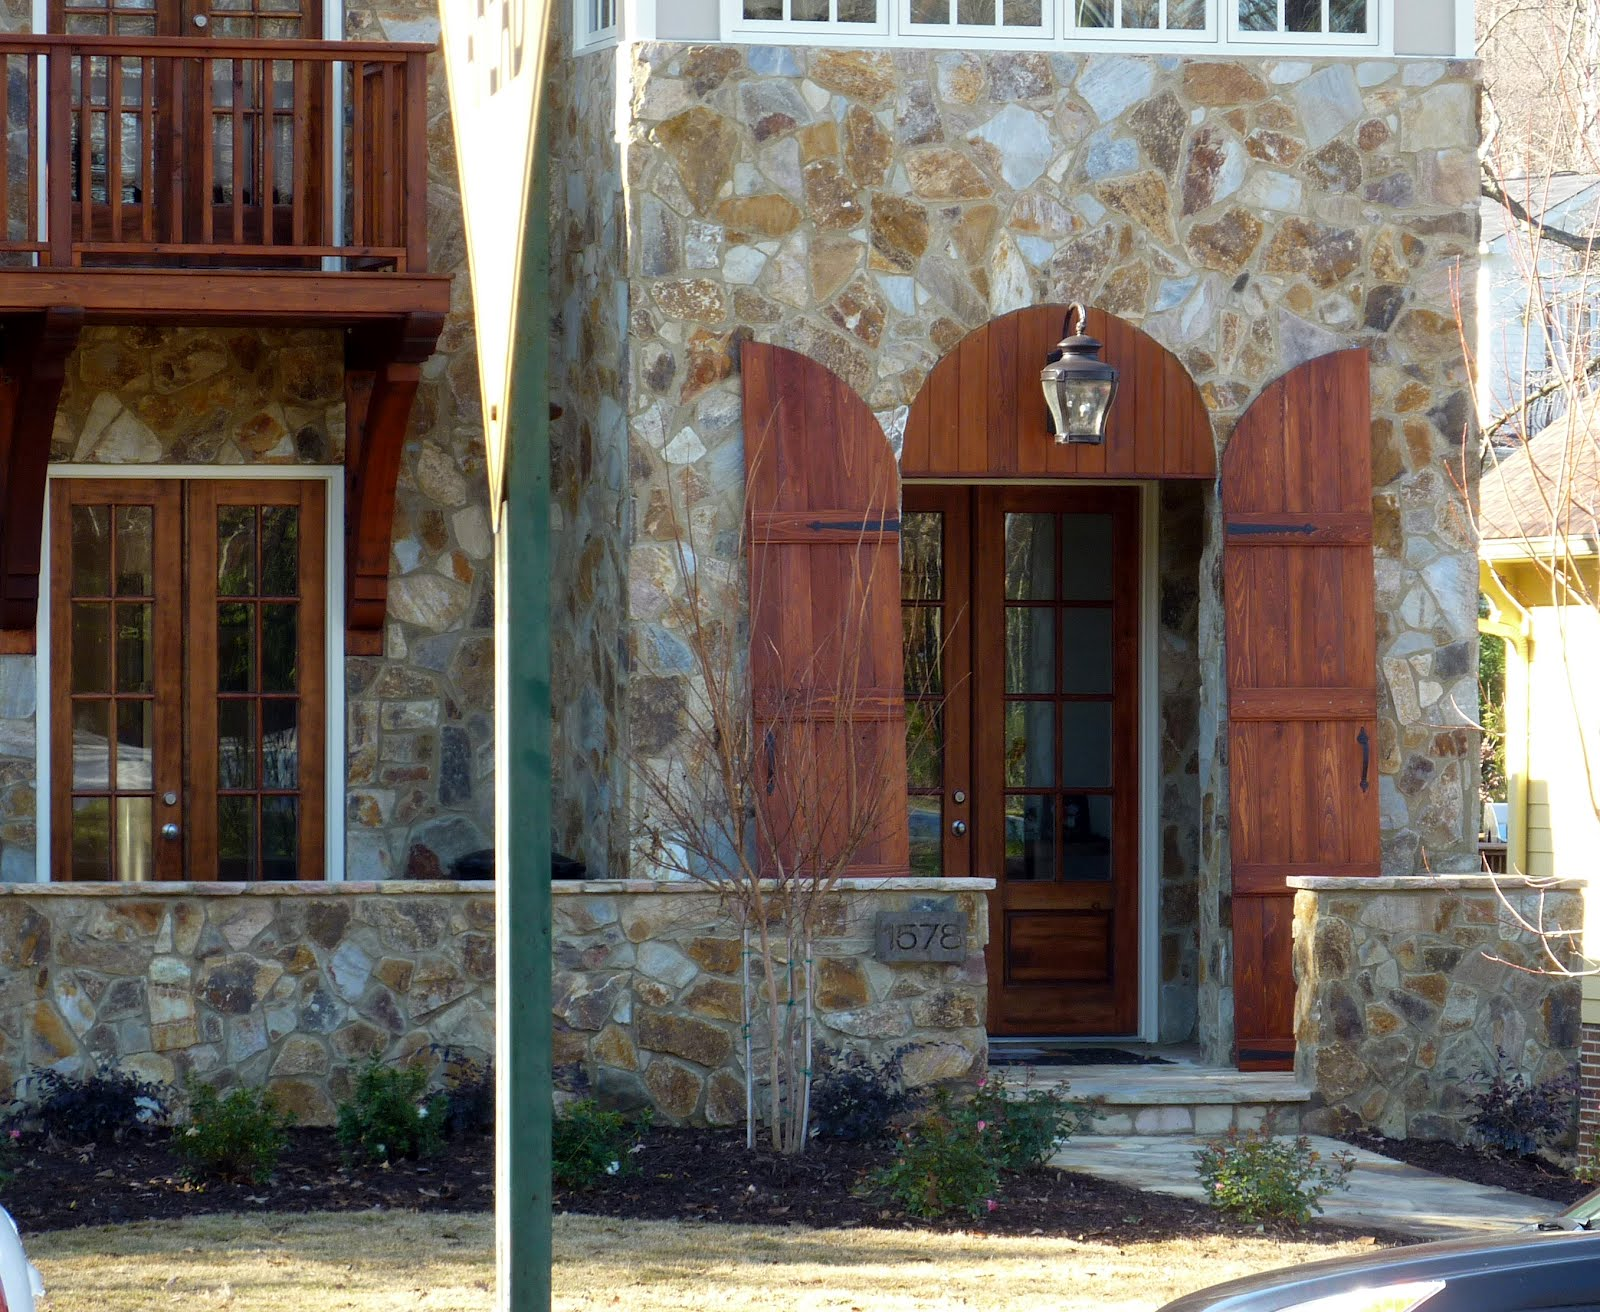 Architecture Tourist Teardown Complete Door Shutters Stone